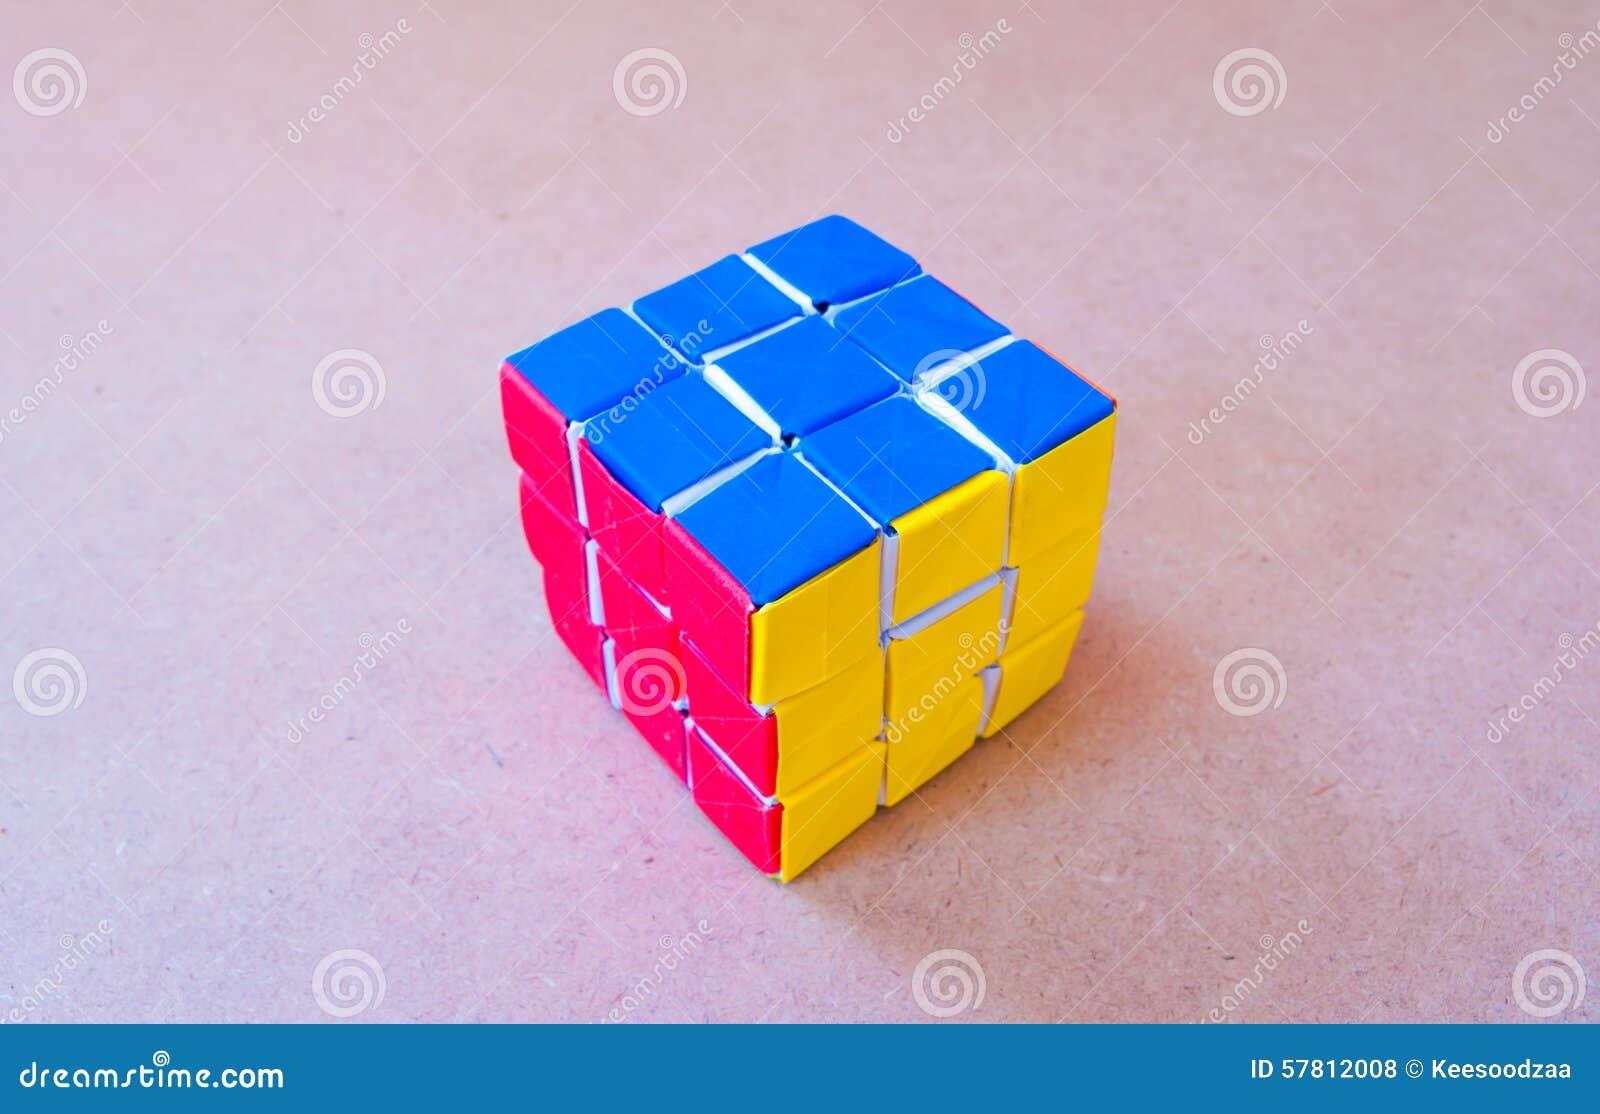 cube de papier en rubik photo stock ditorial image 57812008. Black Bedroom Furniture Sets. Home Design Ideas